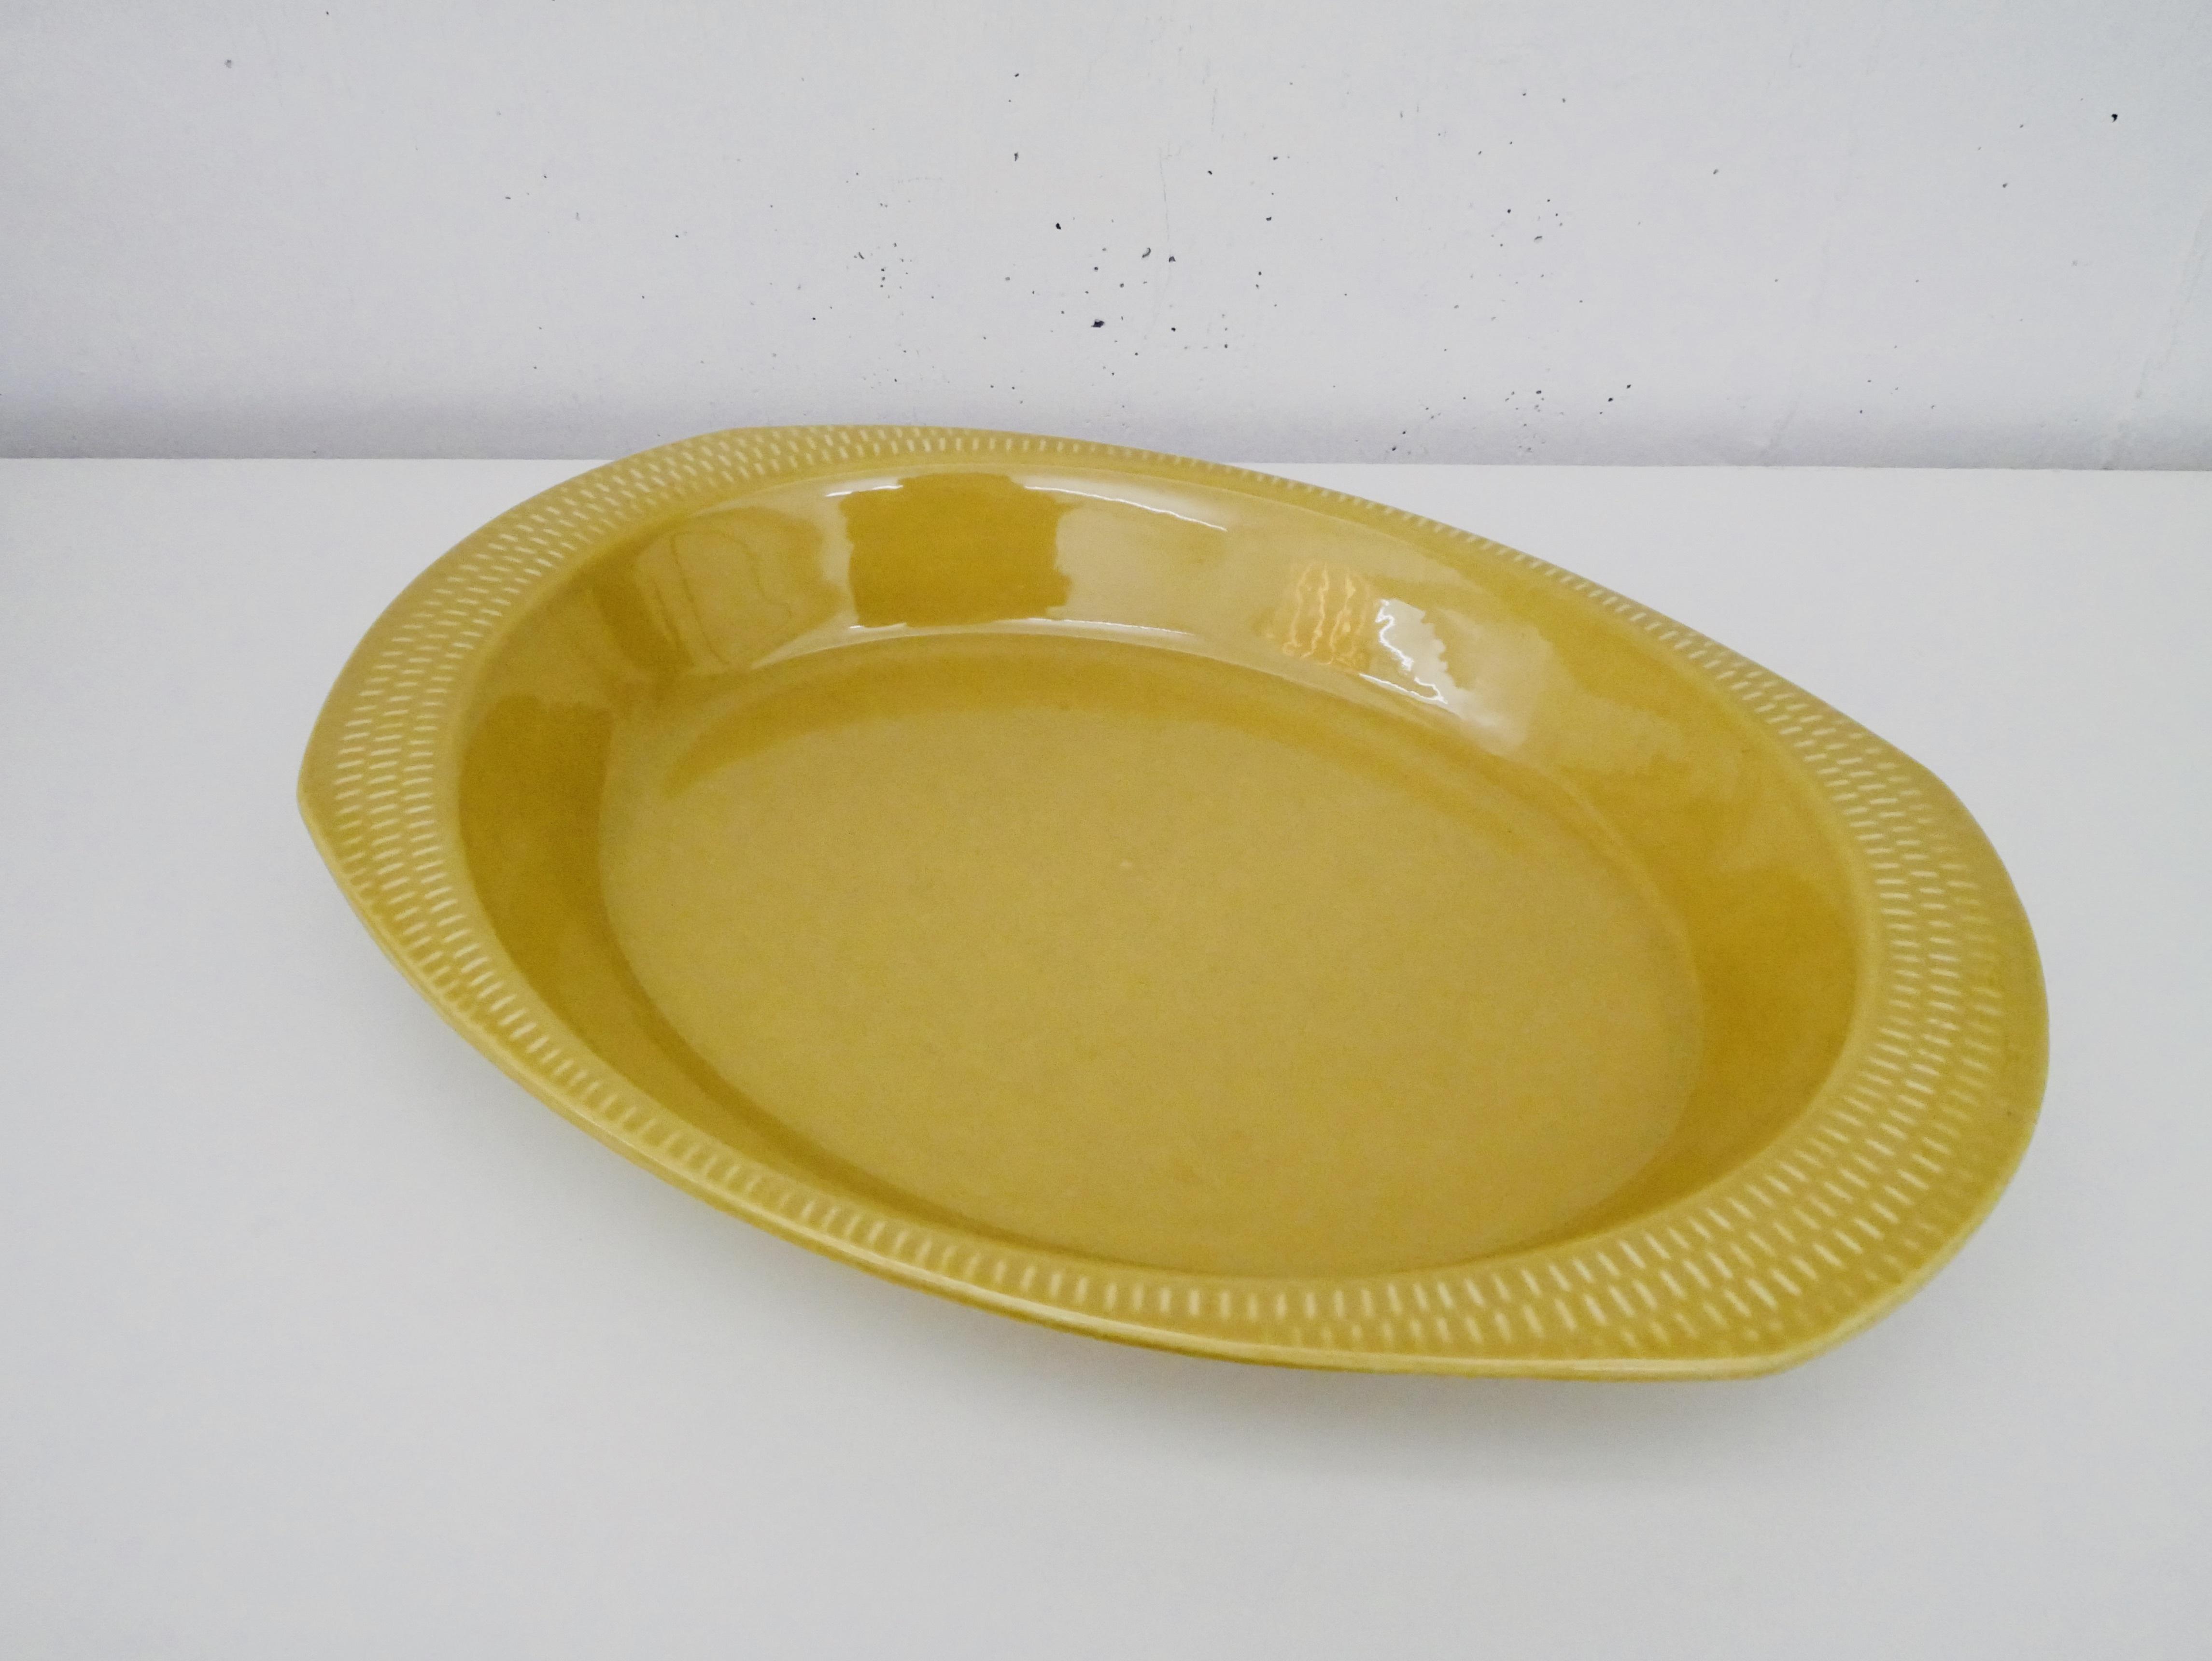 STAVANGERFLINT (スタヴァンゲルフリント)・Brunette(ブリュネット)  グラタン皿